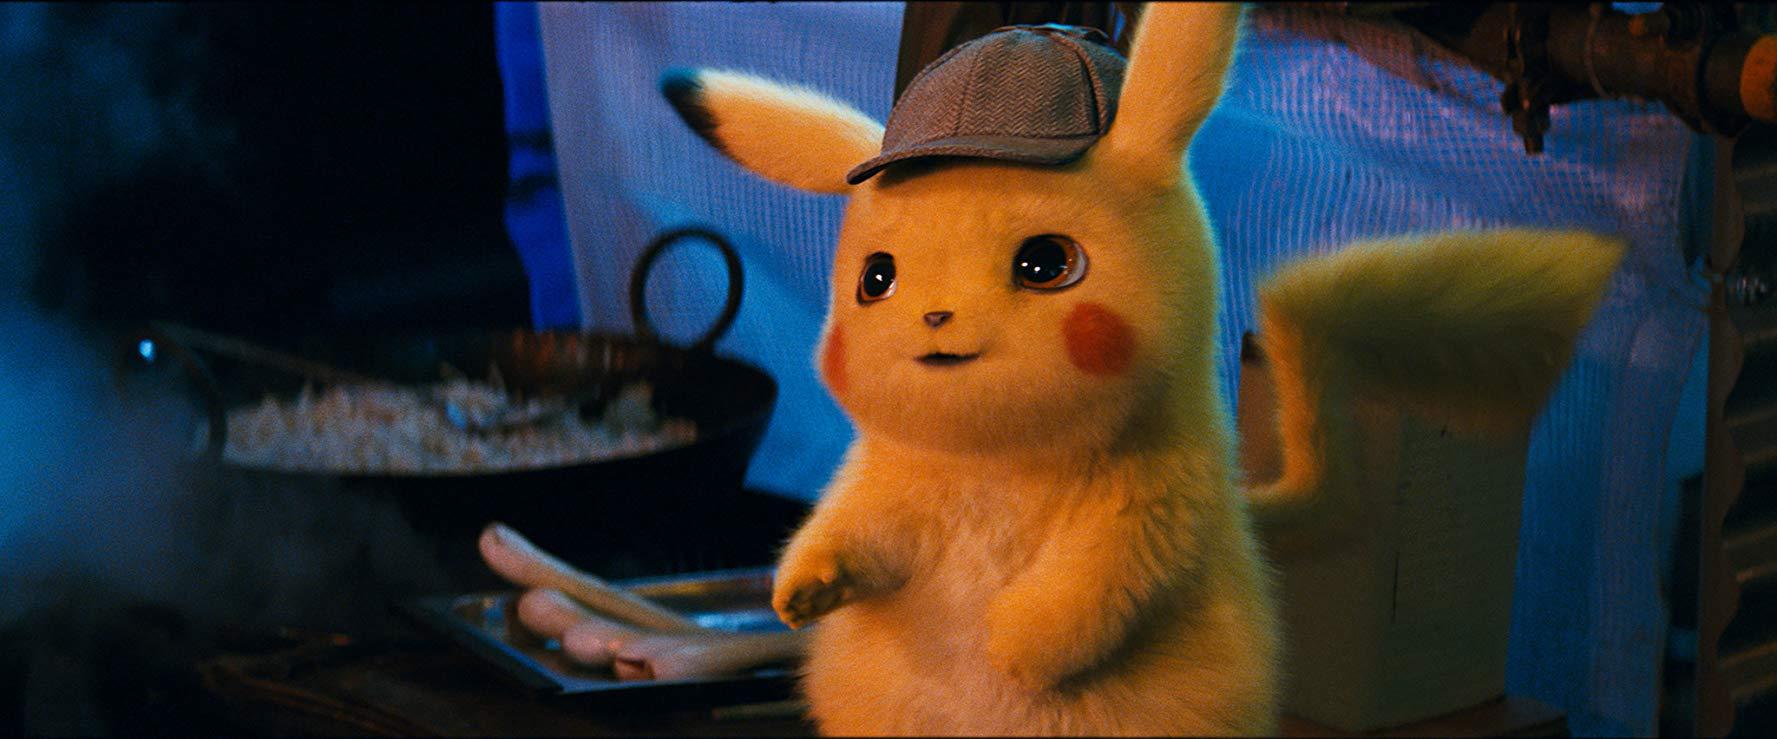 pokemon detective pikachu - 1.jpg